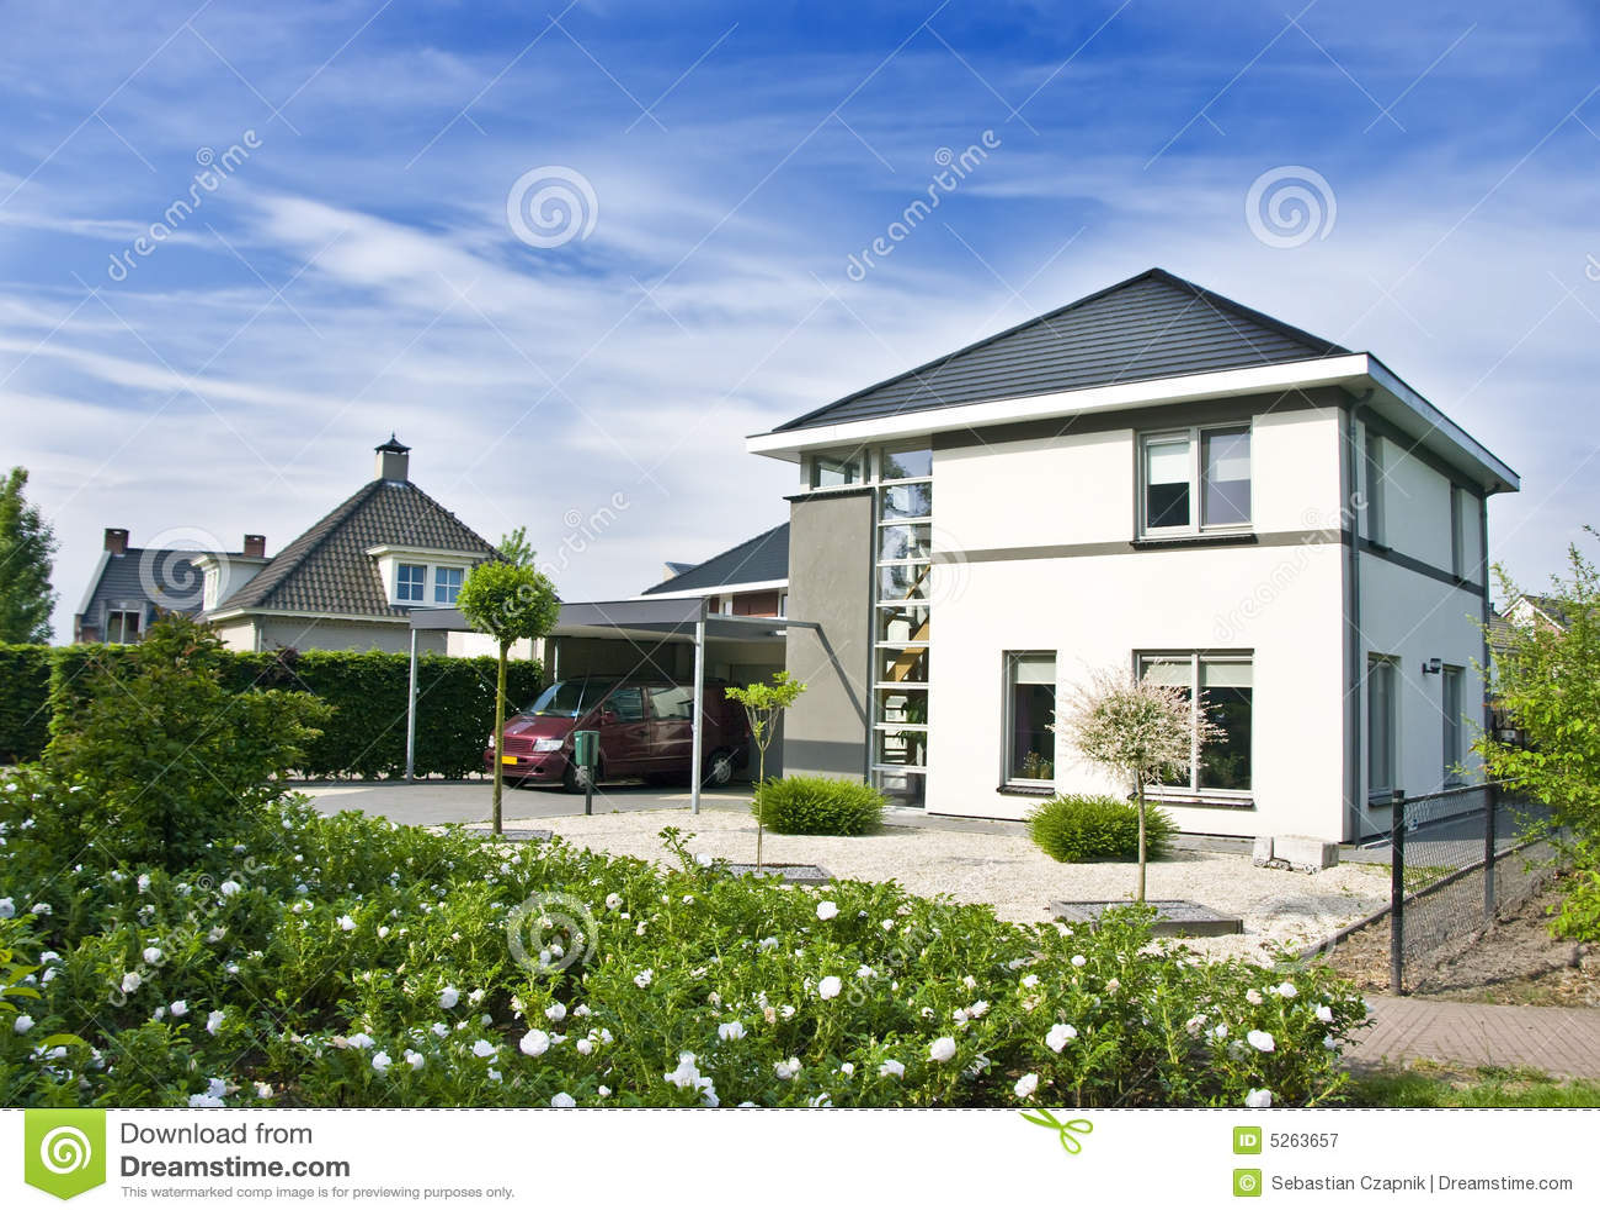 Immagini Di Giardini Moderni : Casa e giardino moderni immagine stock immagine di disegno